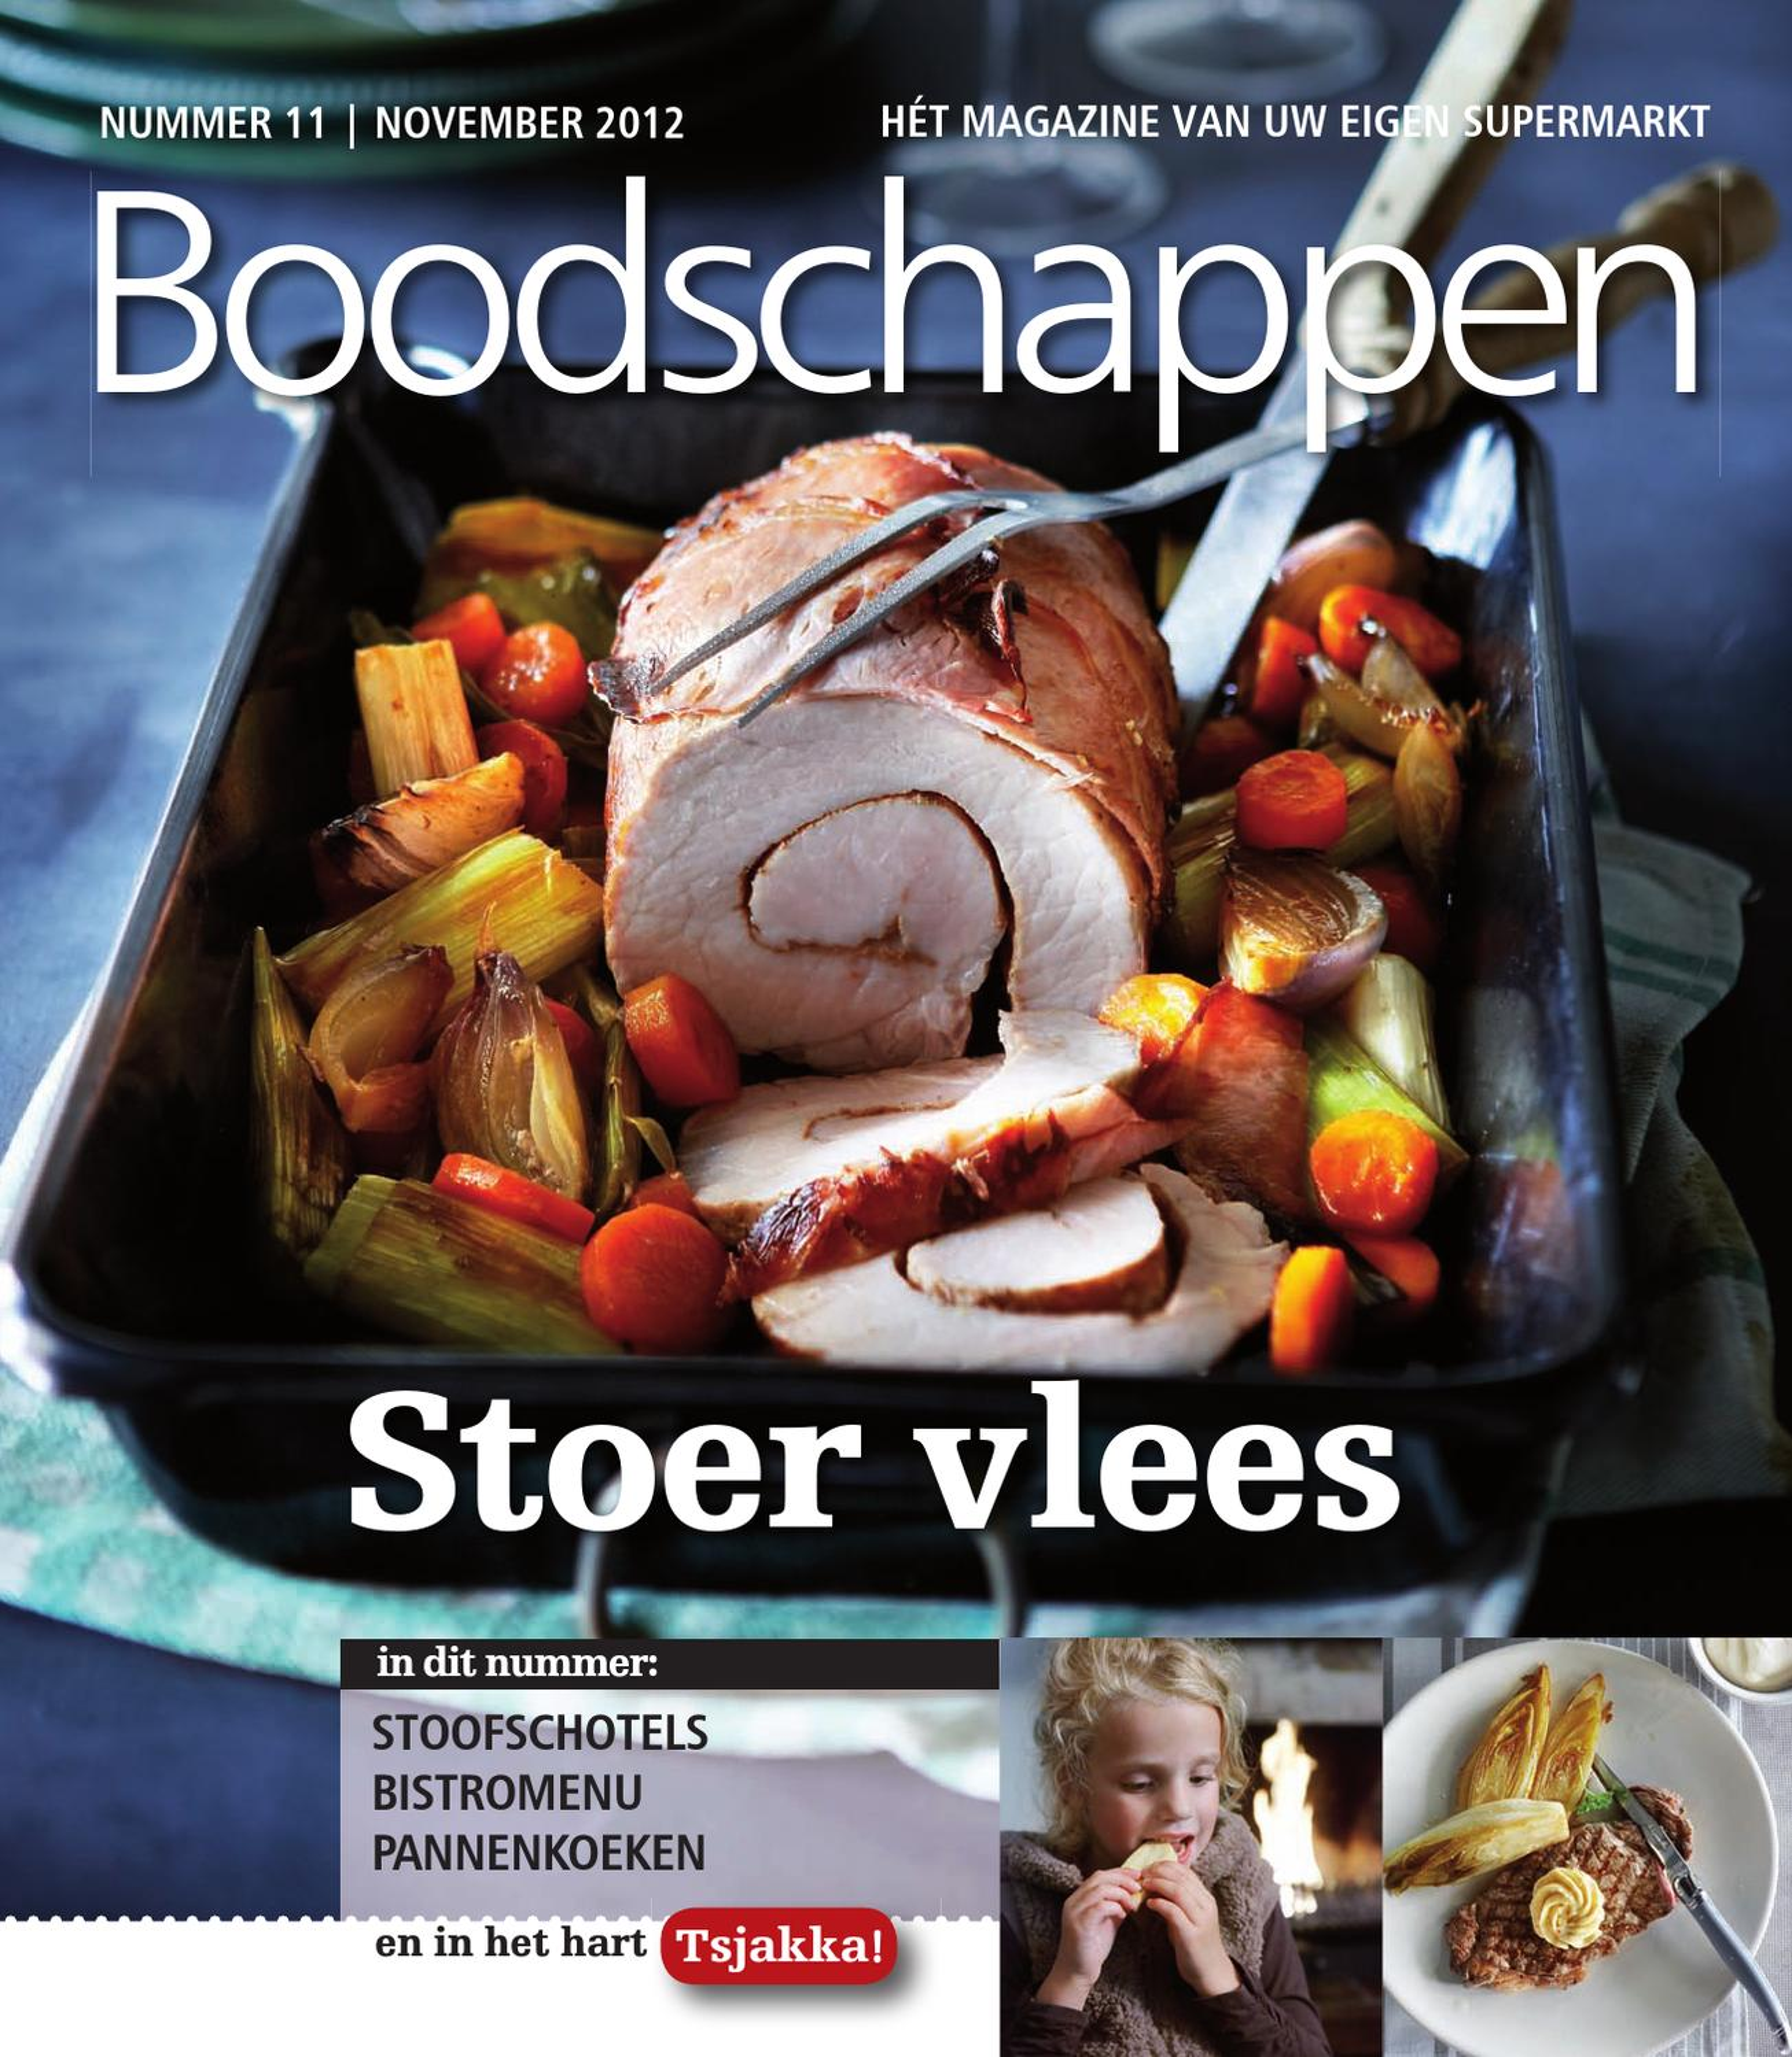 Boodschappen editie 10   oktober 2014 by indicia   issuu